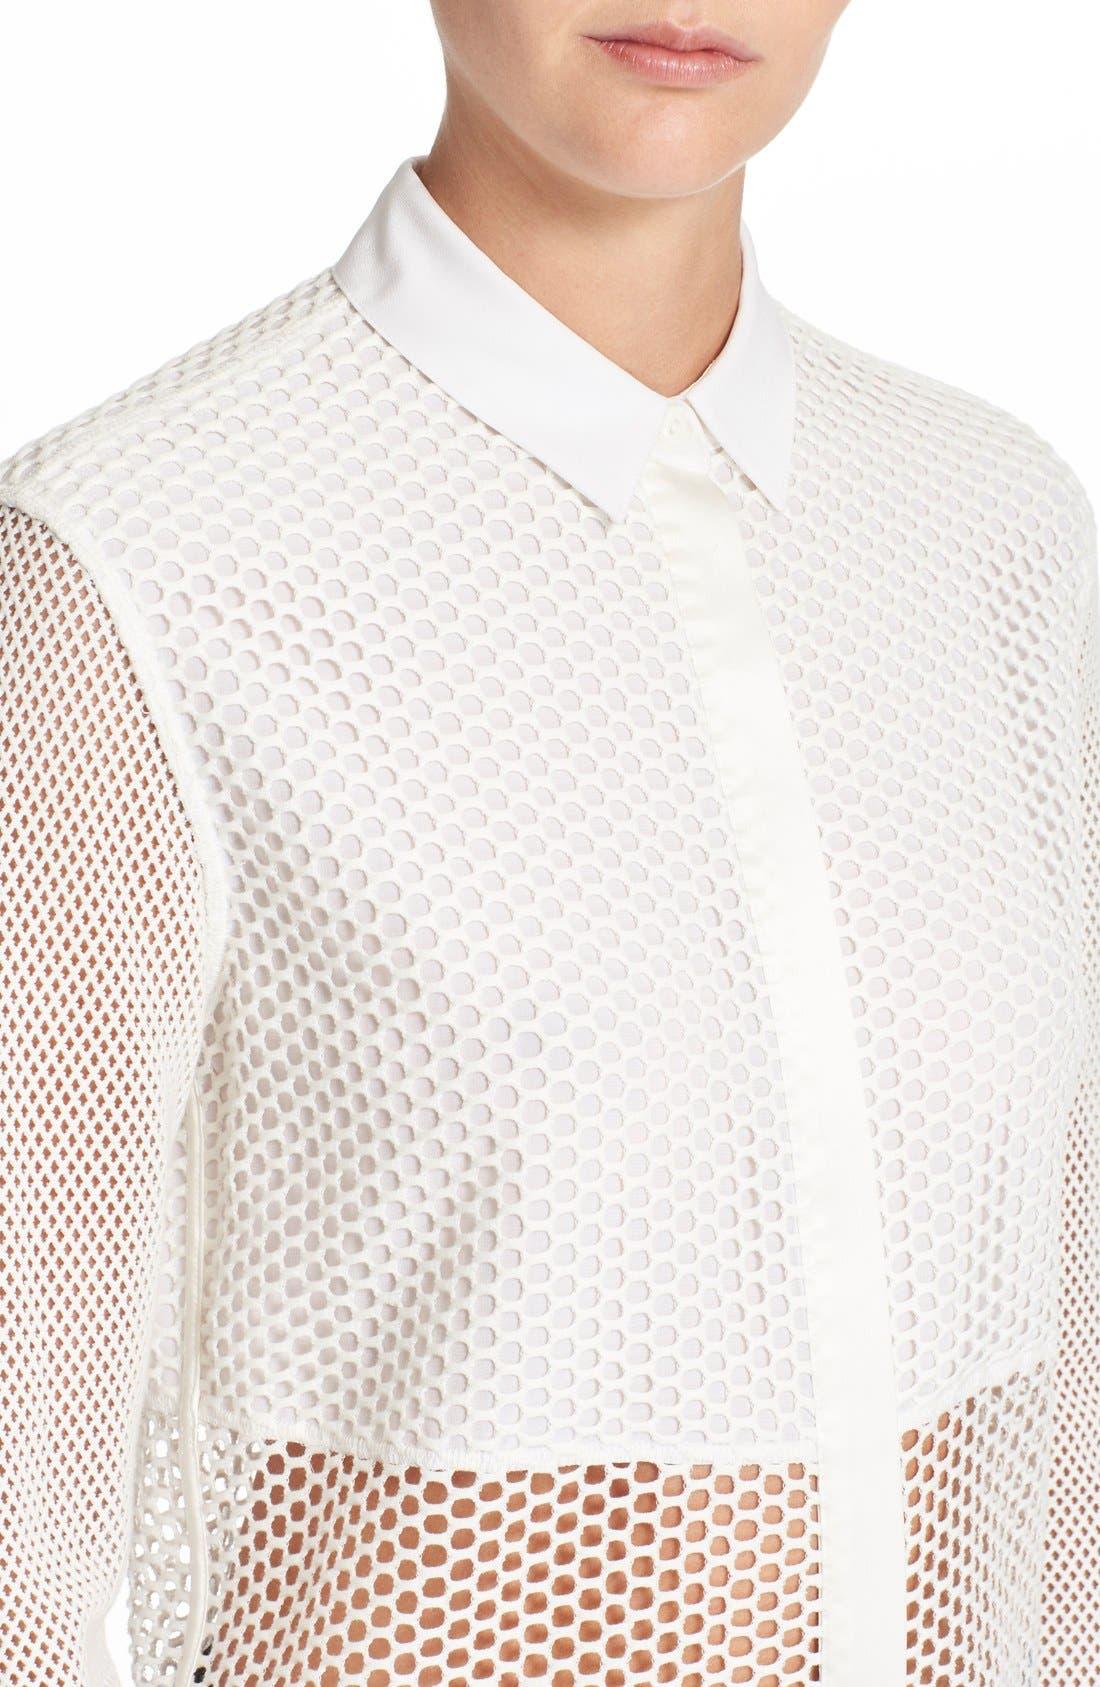 Alternate Image 4  - rag & bone 'Luna' Stretch Cotton Mesh Shirt